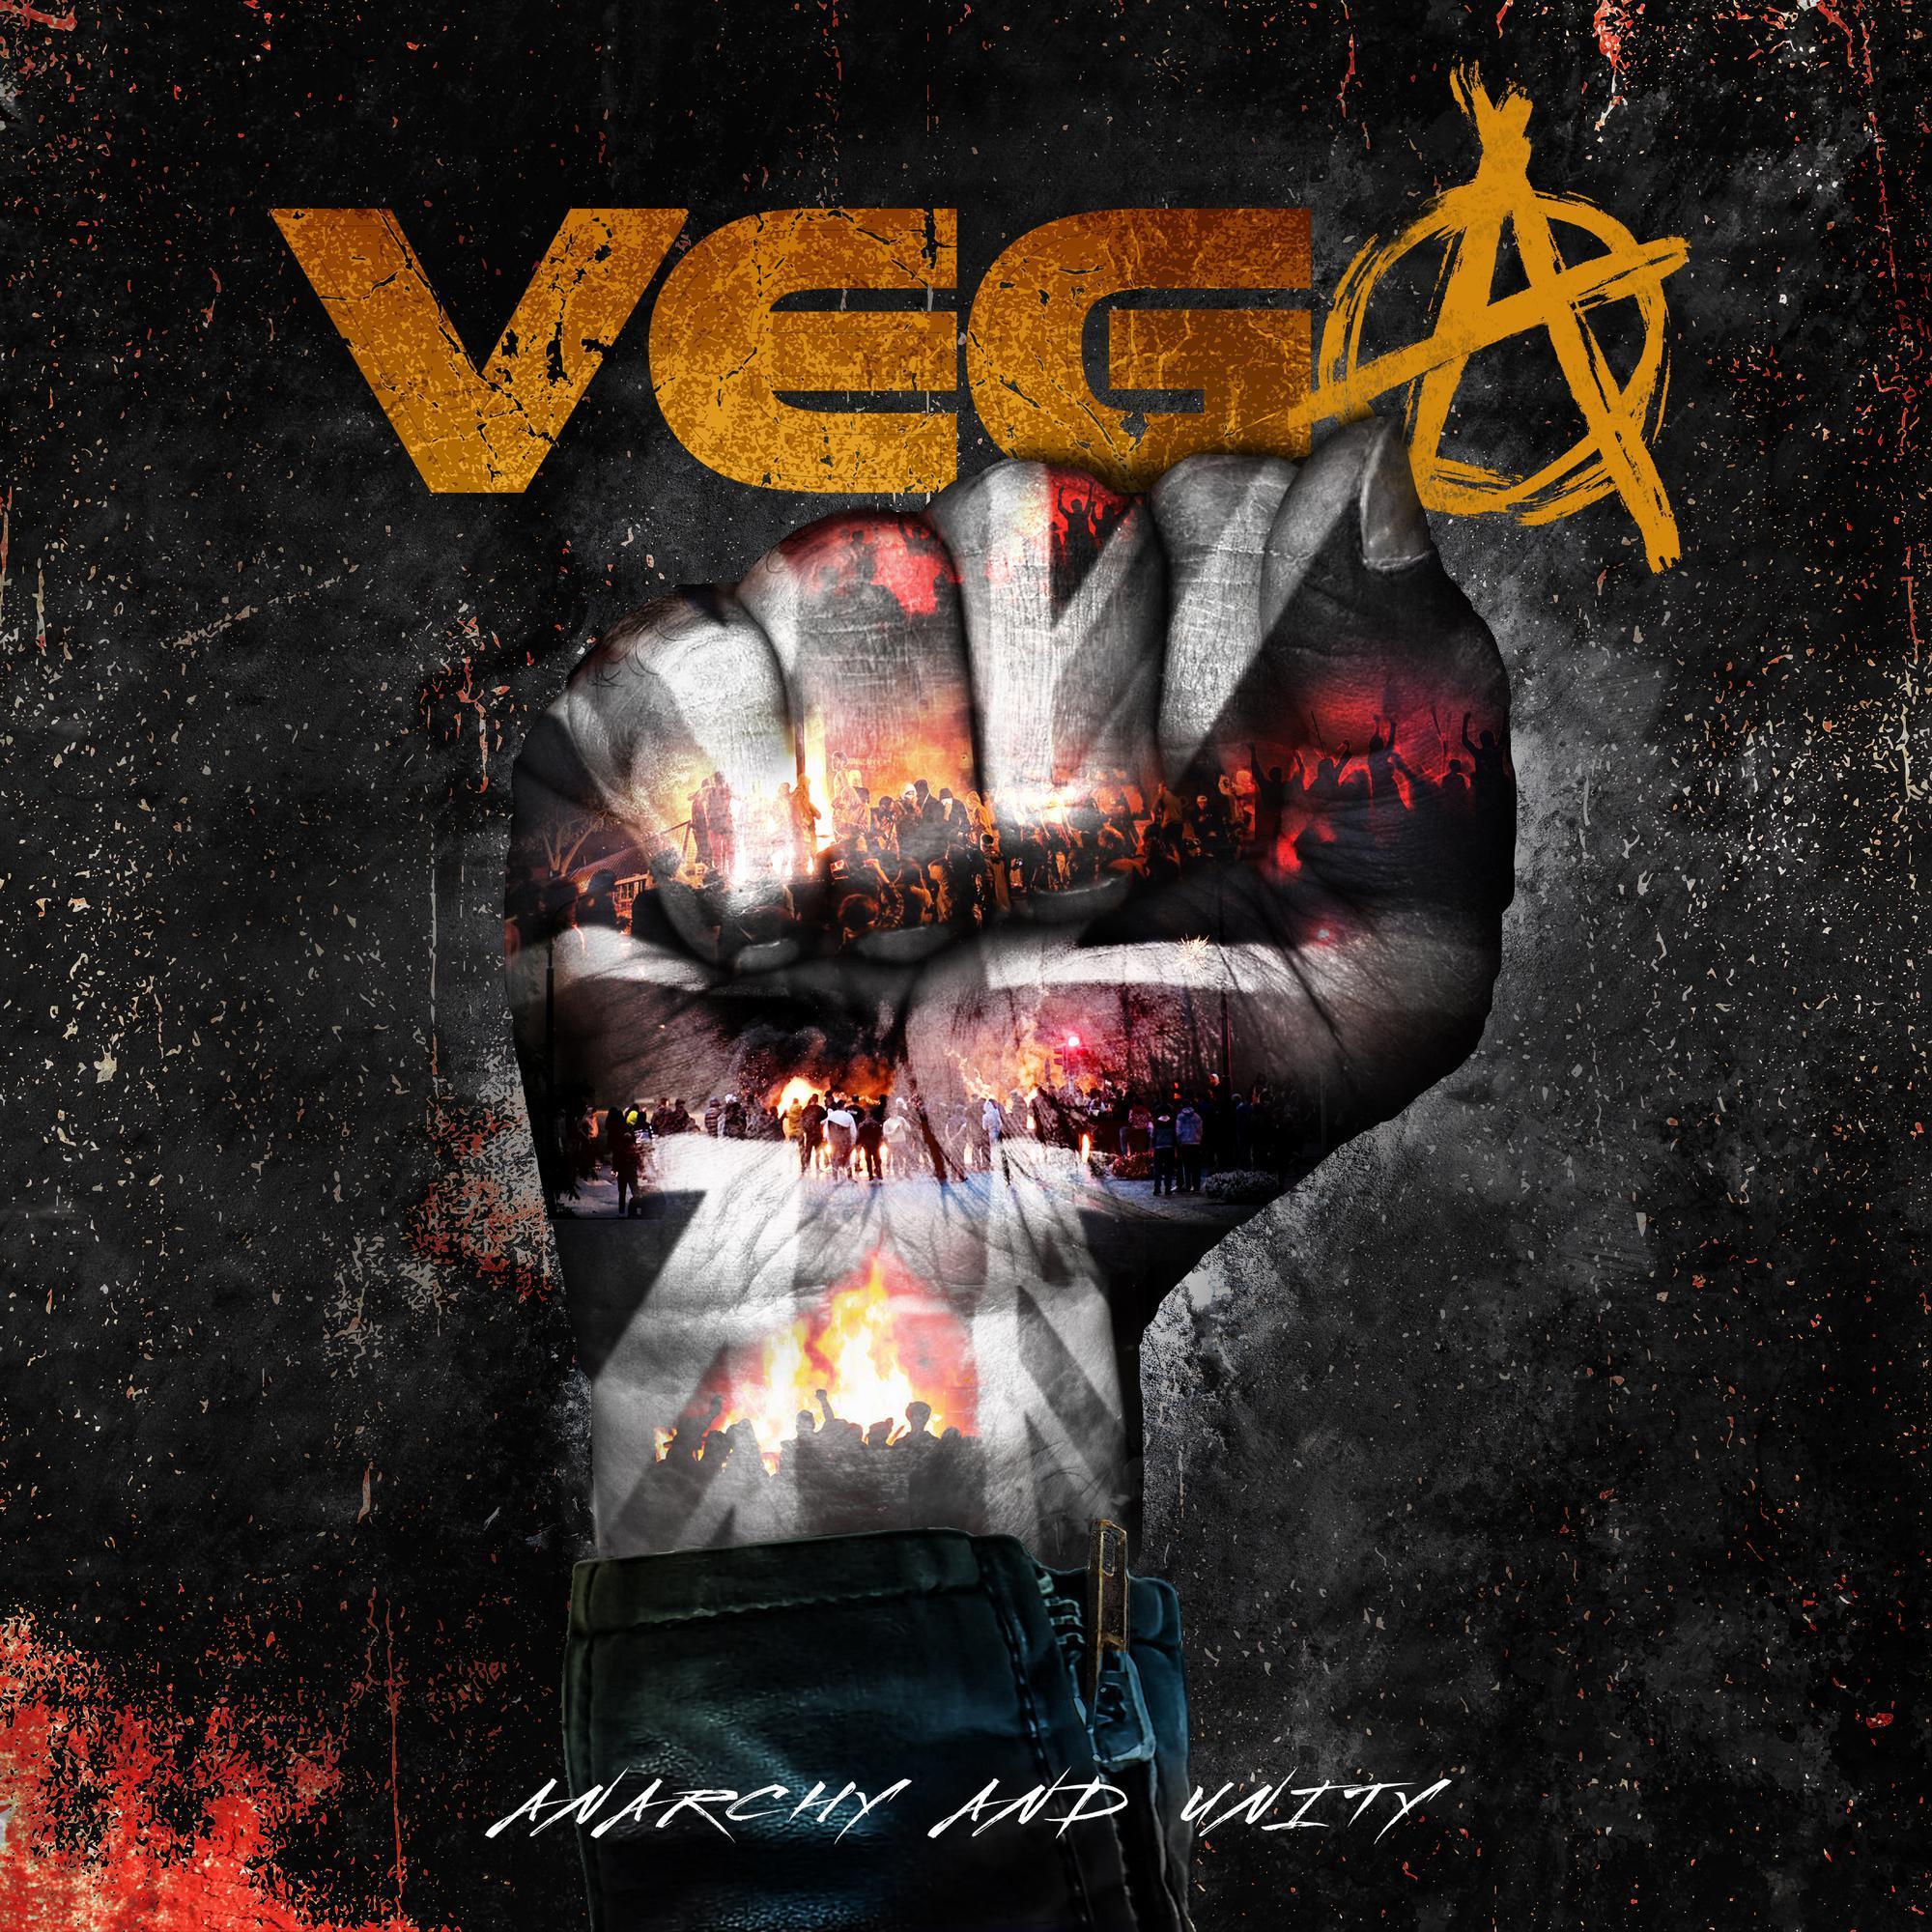 vega anarchy and unity